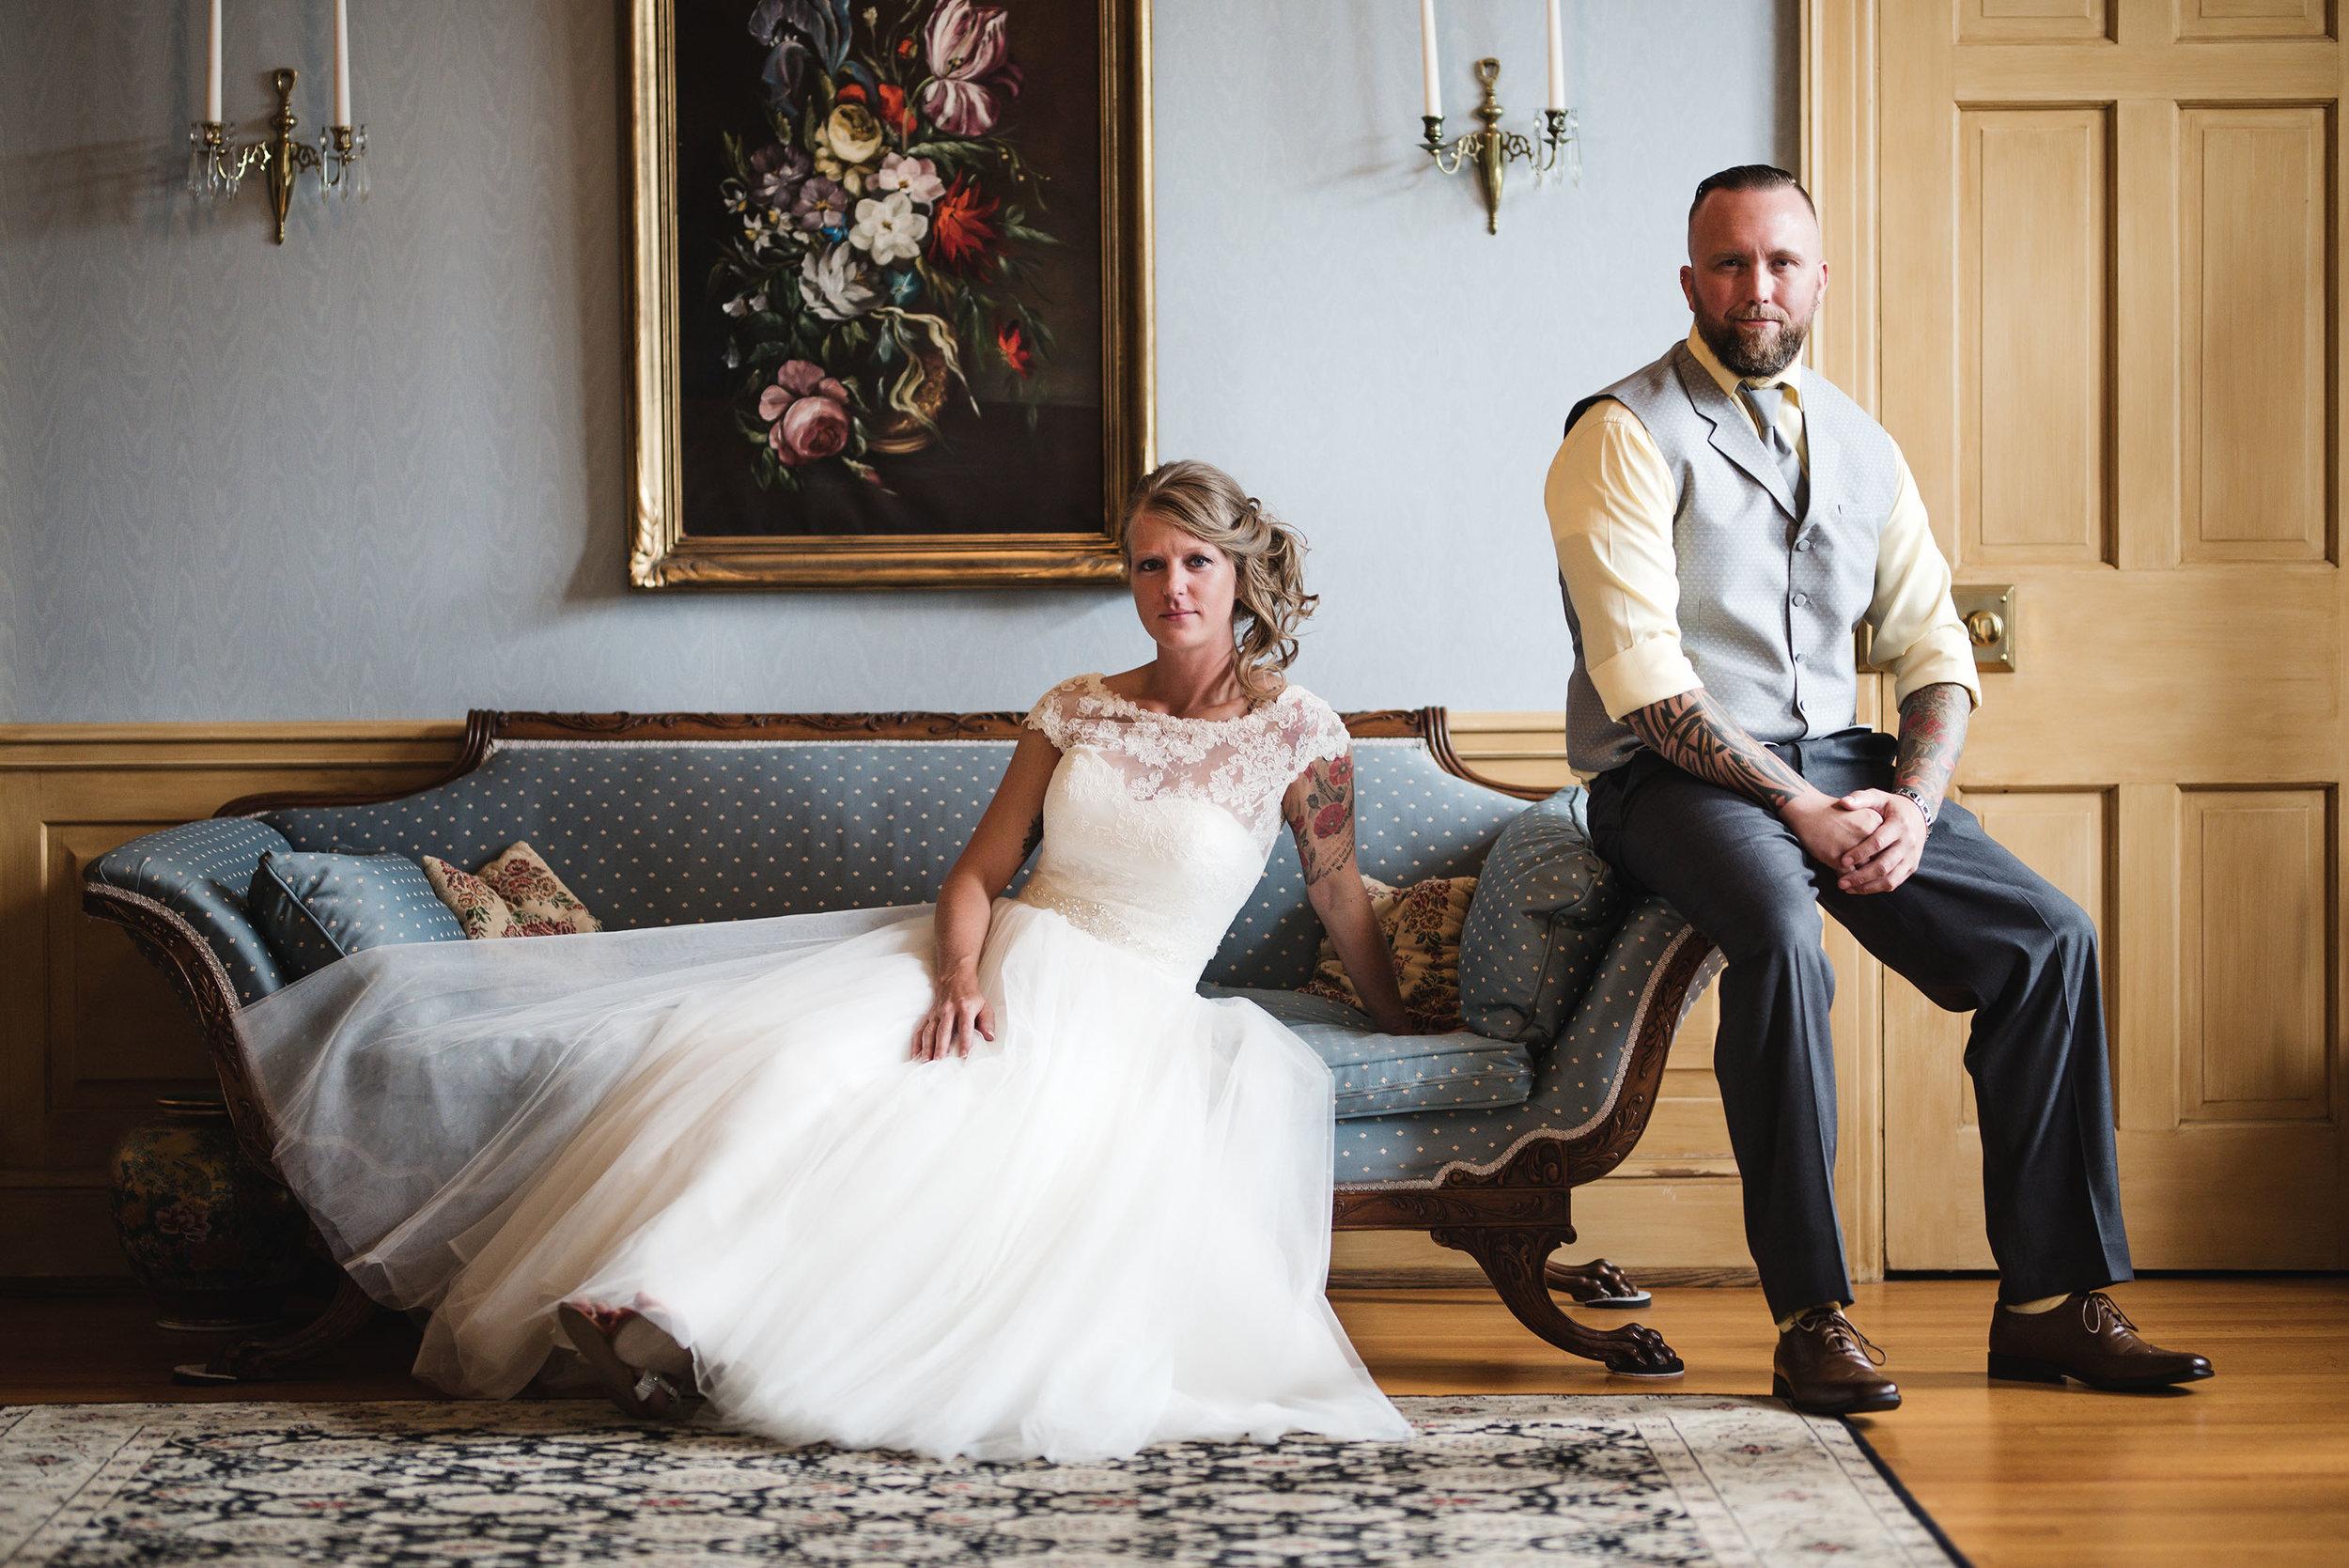 lancaster ohio wedding photographer portrait of bride and groom